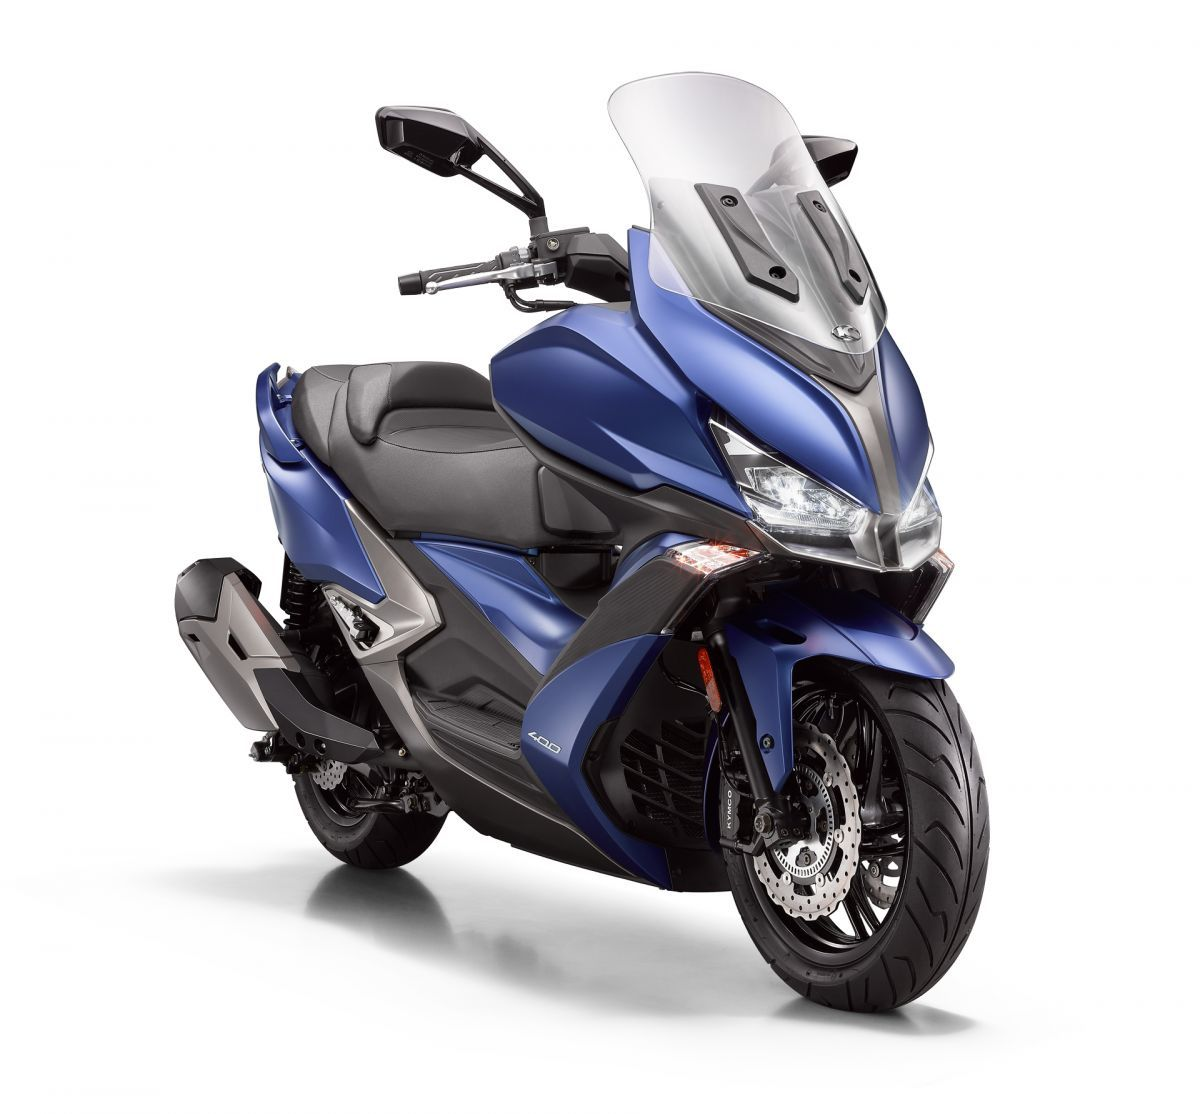 Motocicleta Kymco Xciting s 400